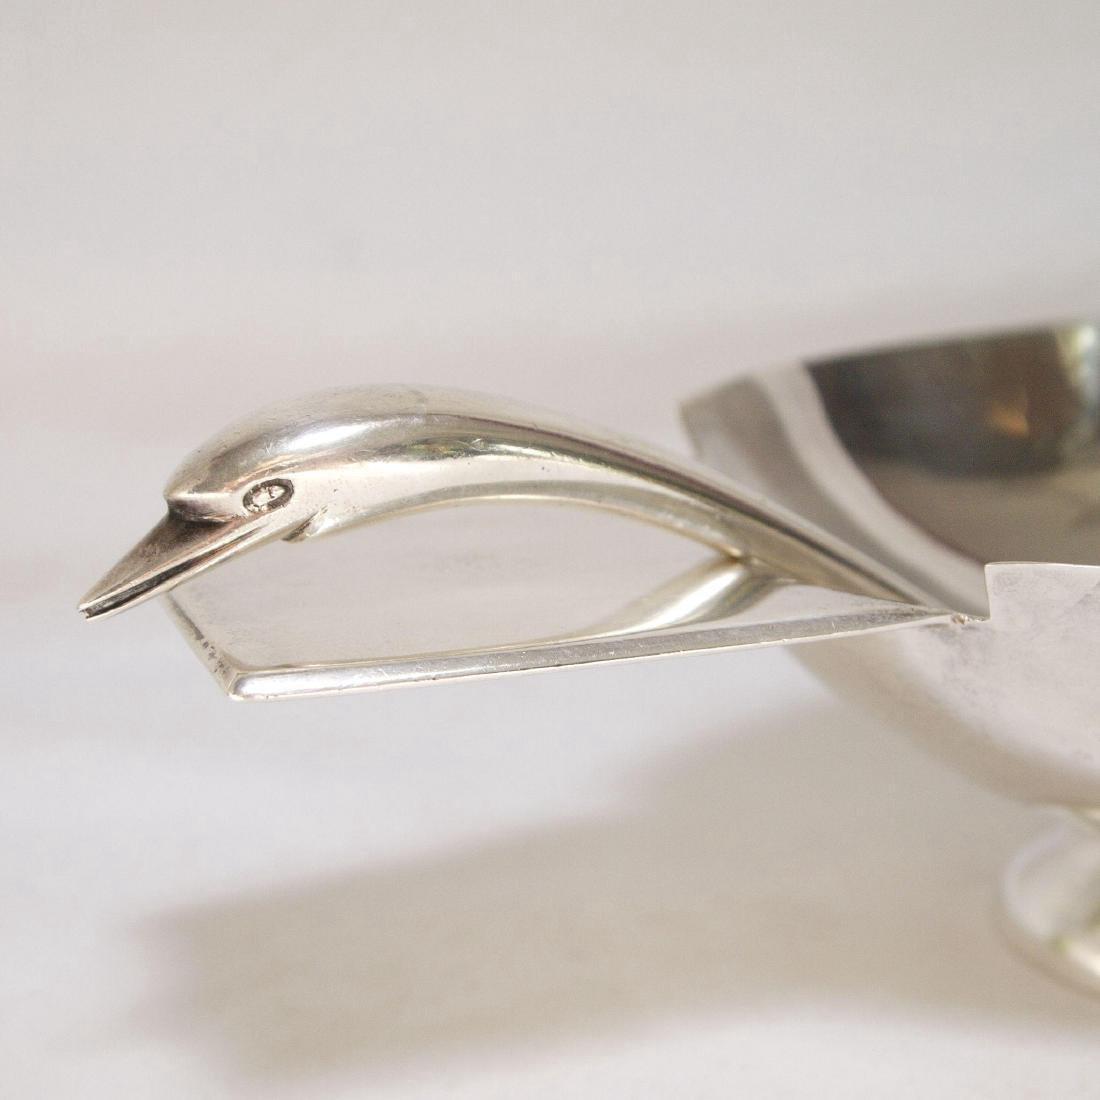 Mid Century Modern Sterling Silver Gravy Bowl & Spoon - 4